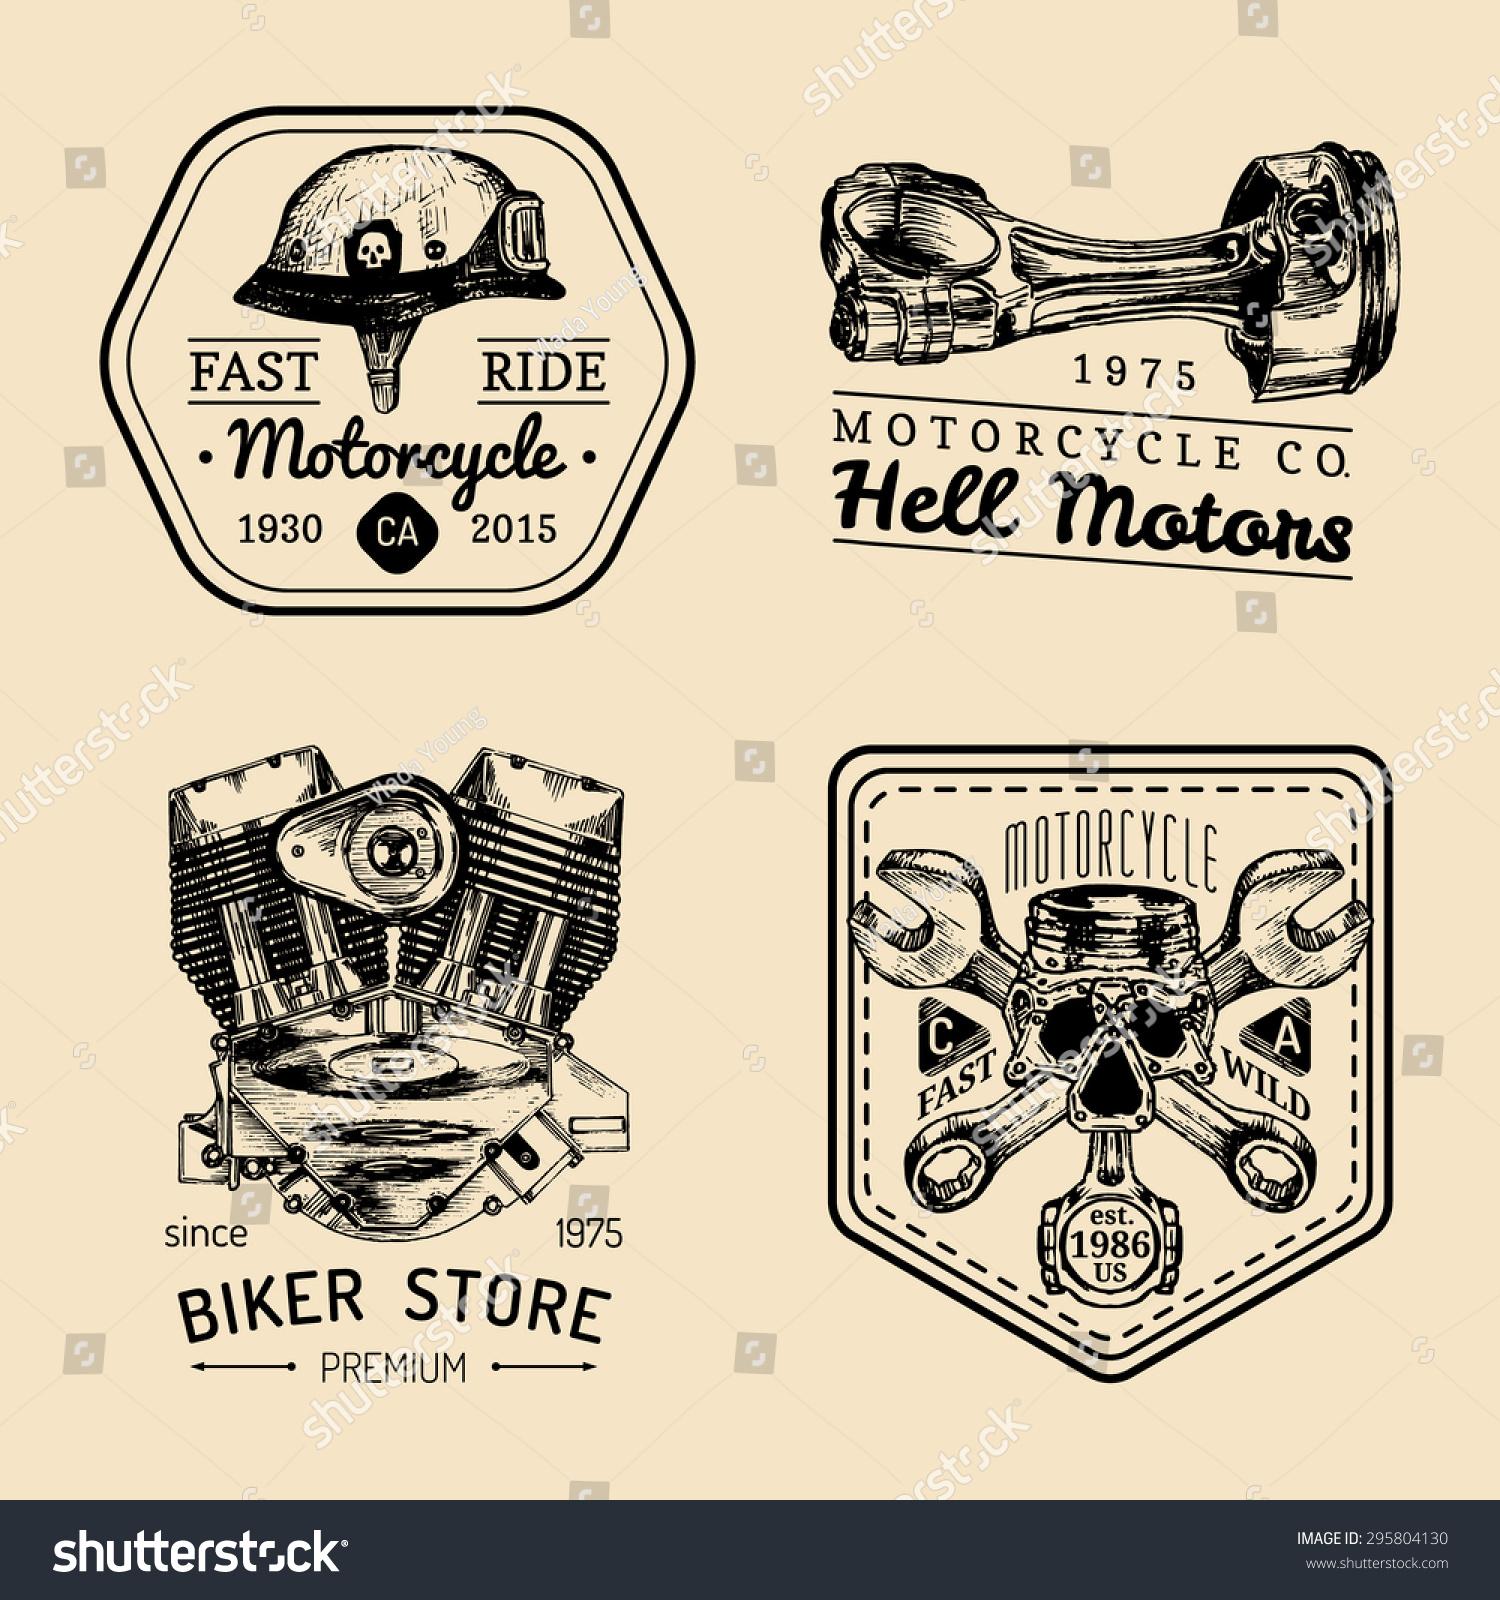 Vector Vintage Motorcycle Repair Logos Set Stock Vector